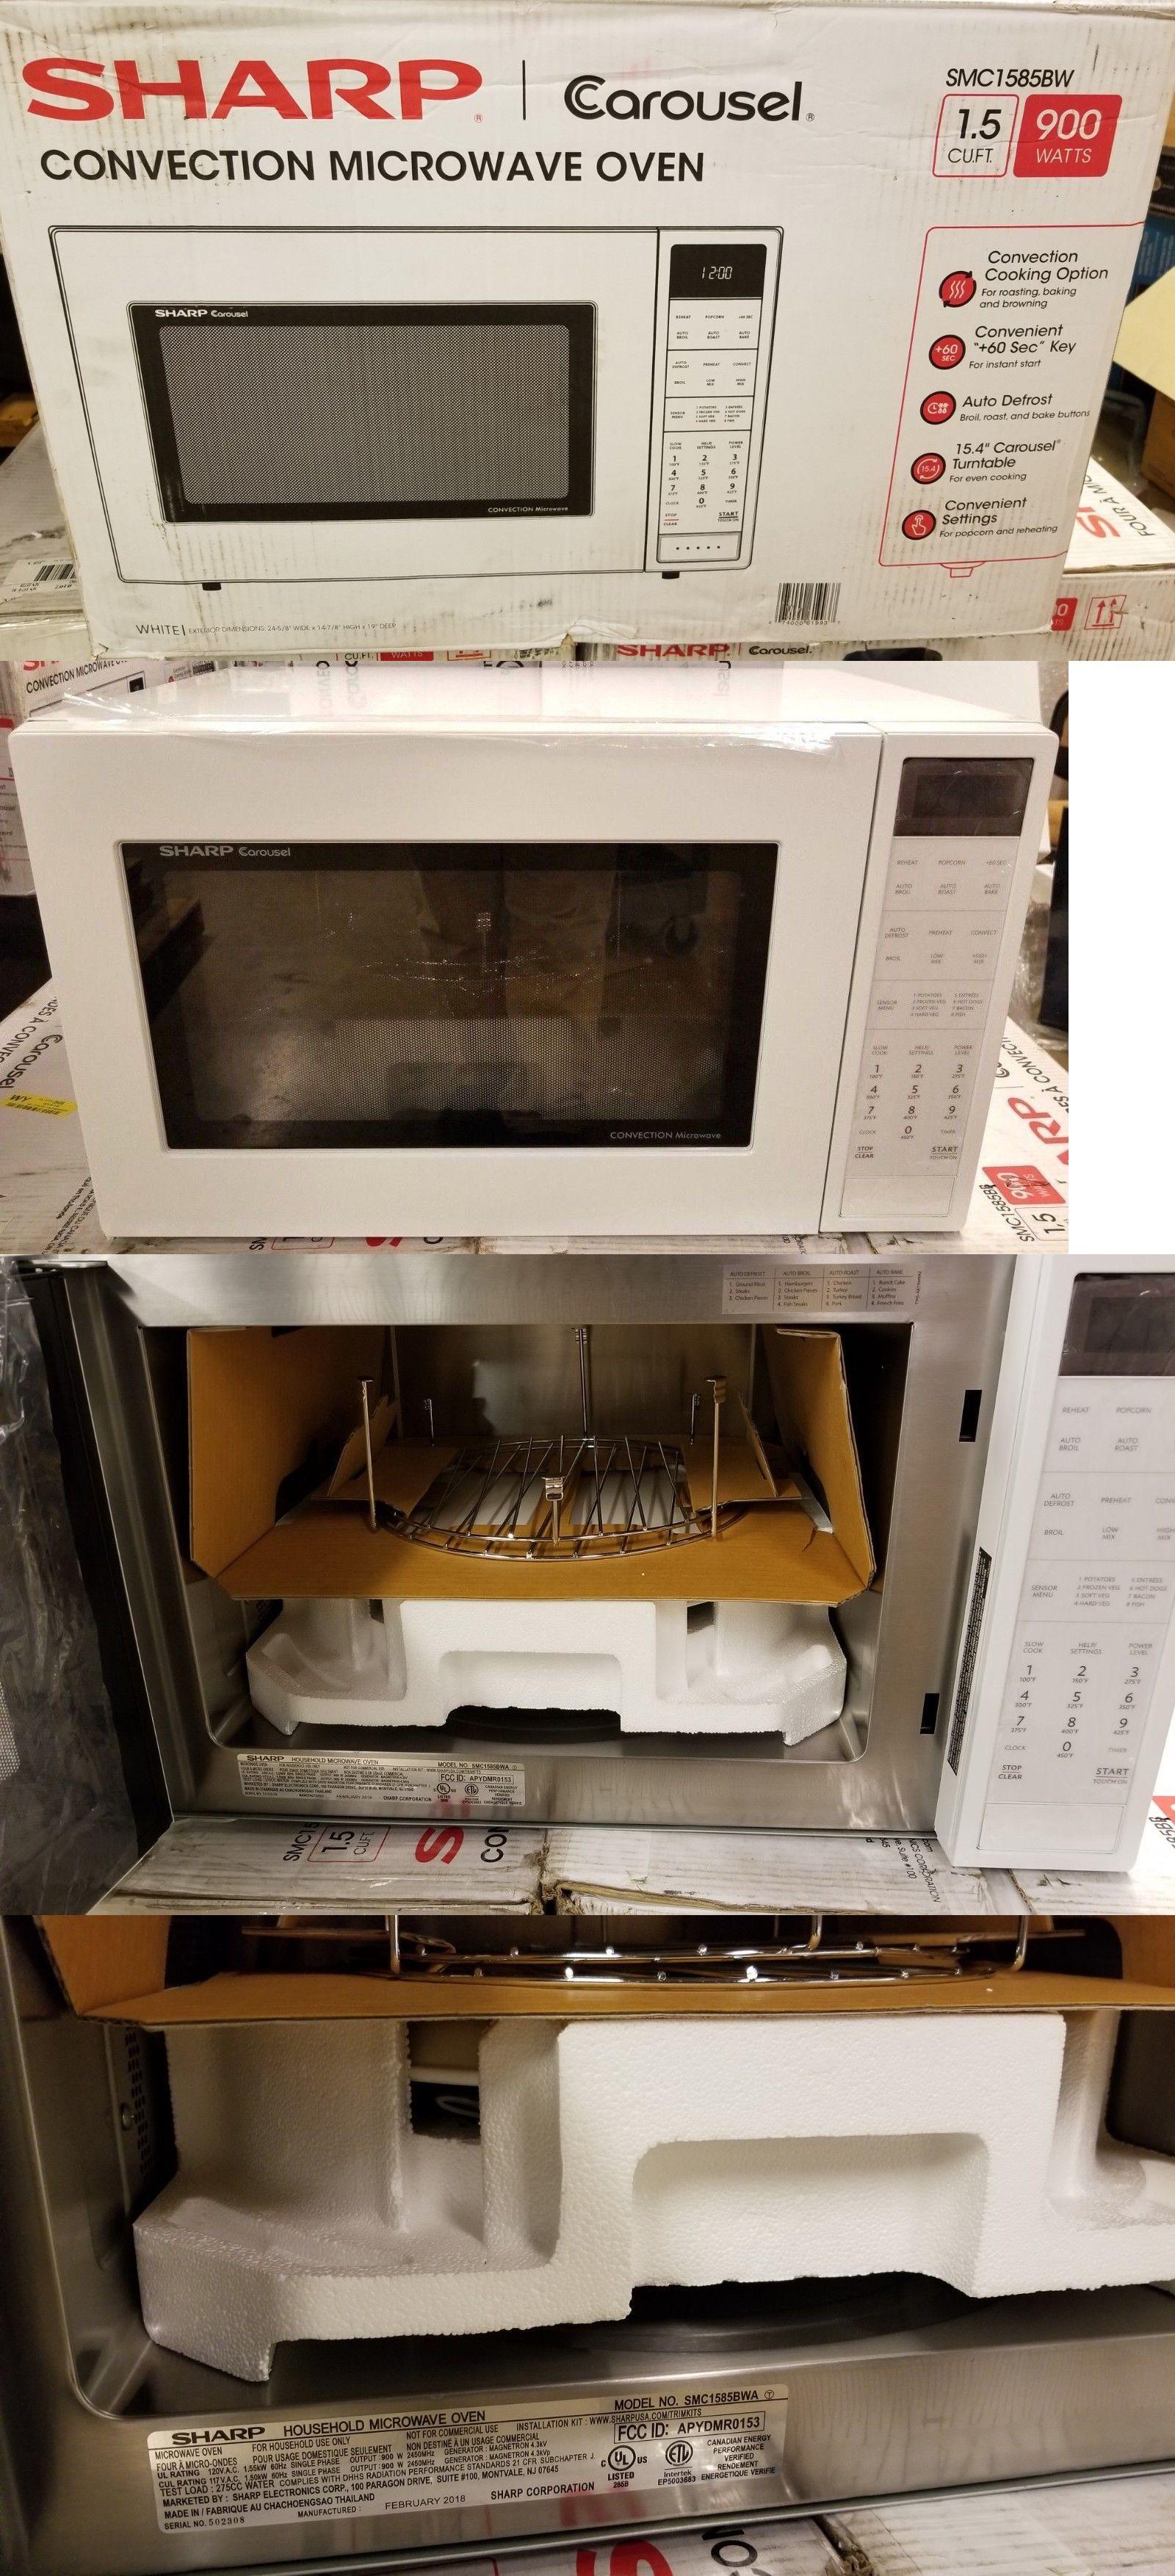 Microwave Ovens 150140 Sharp Smc1585bw 1 5 Cu Ft 900w Carousel